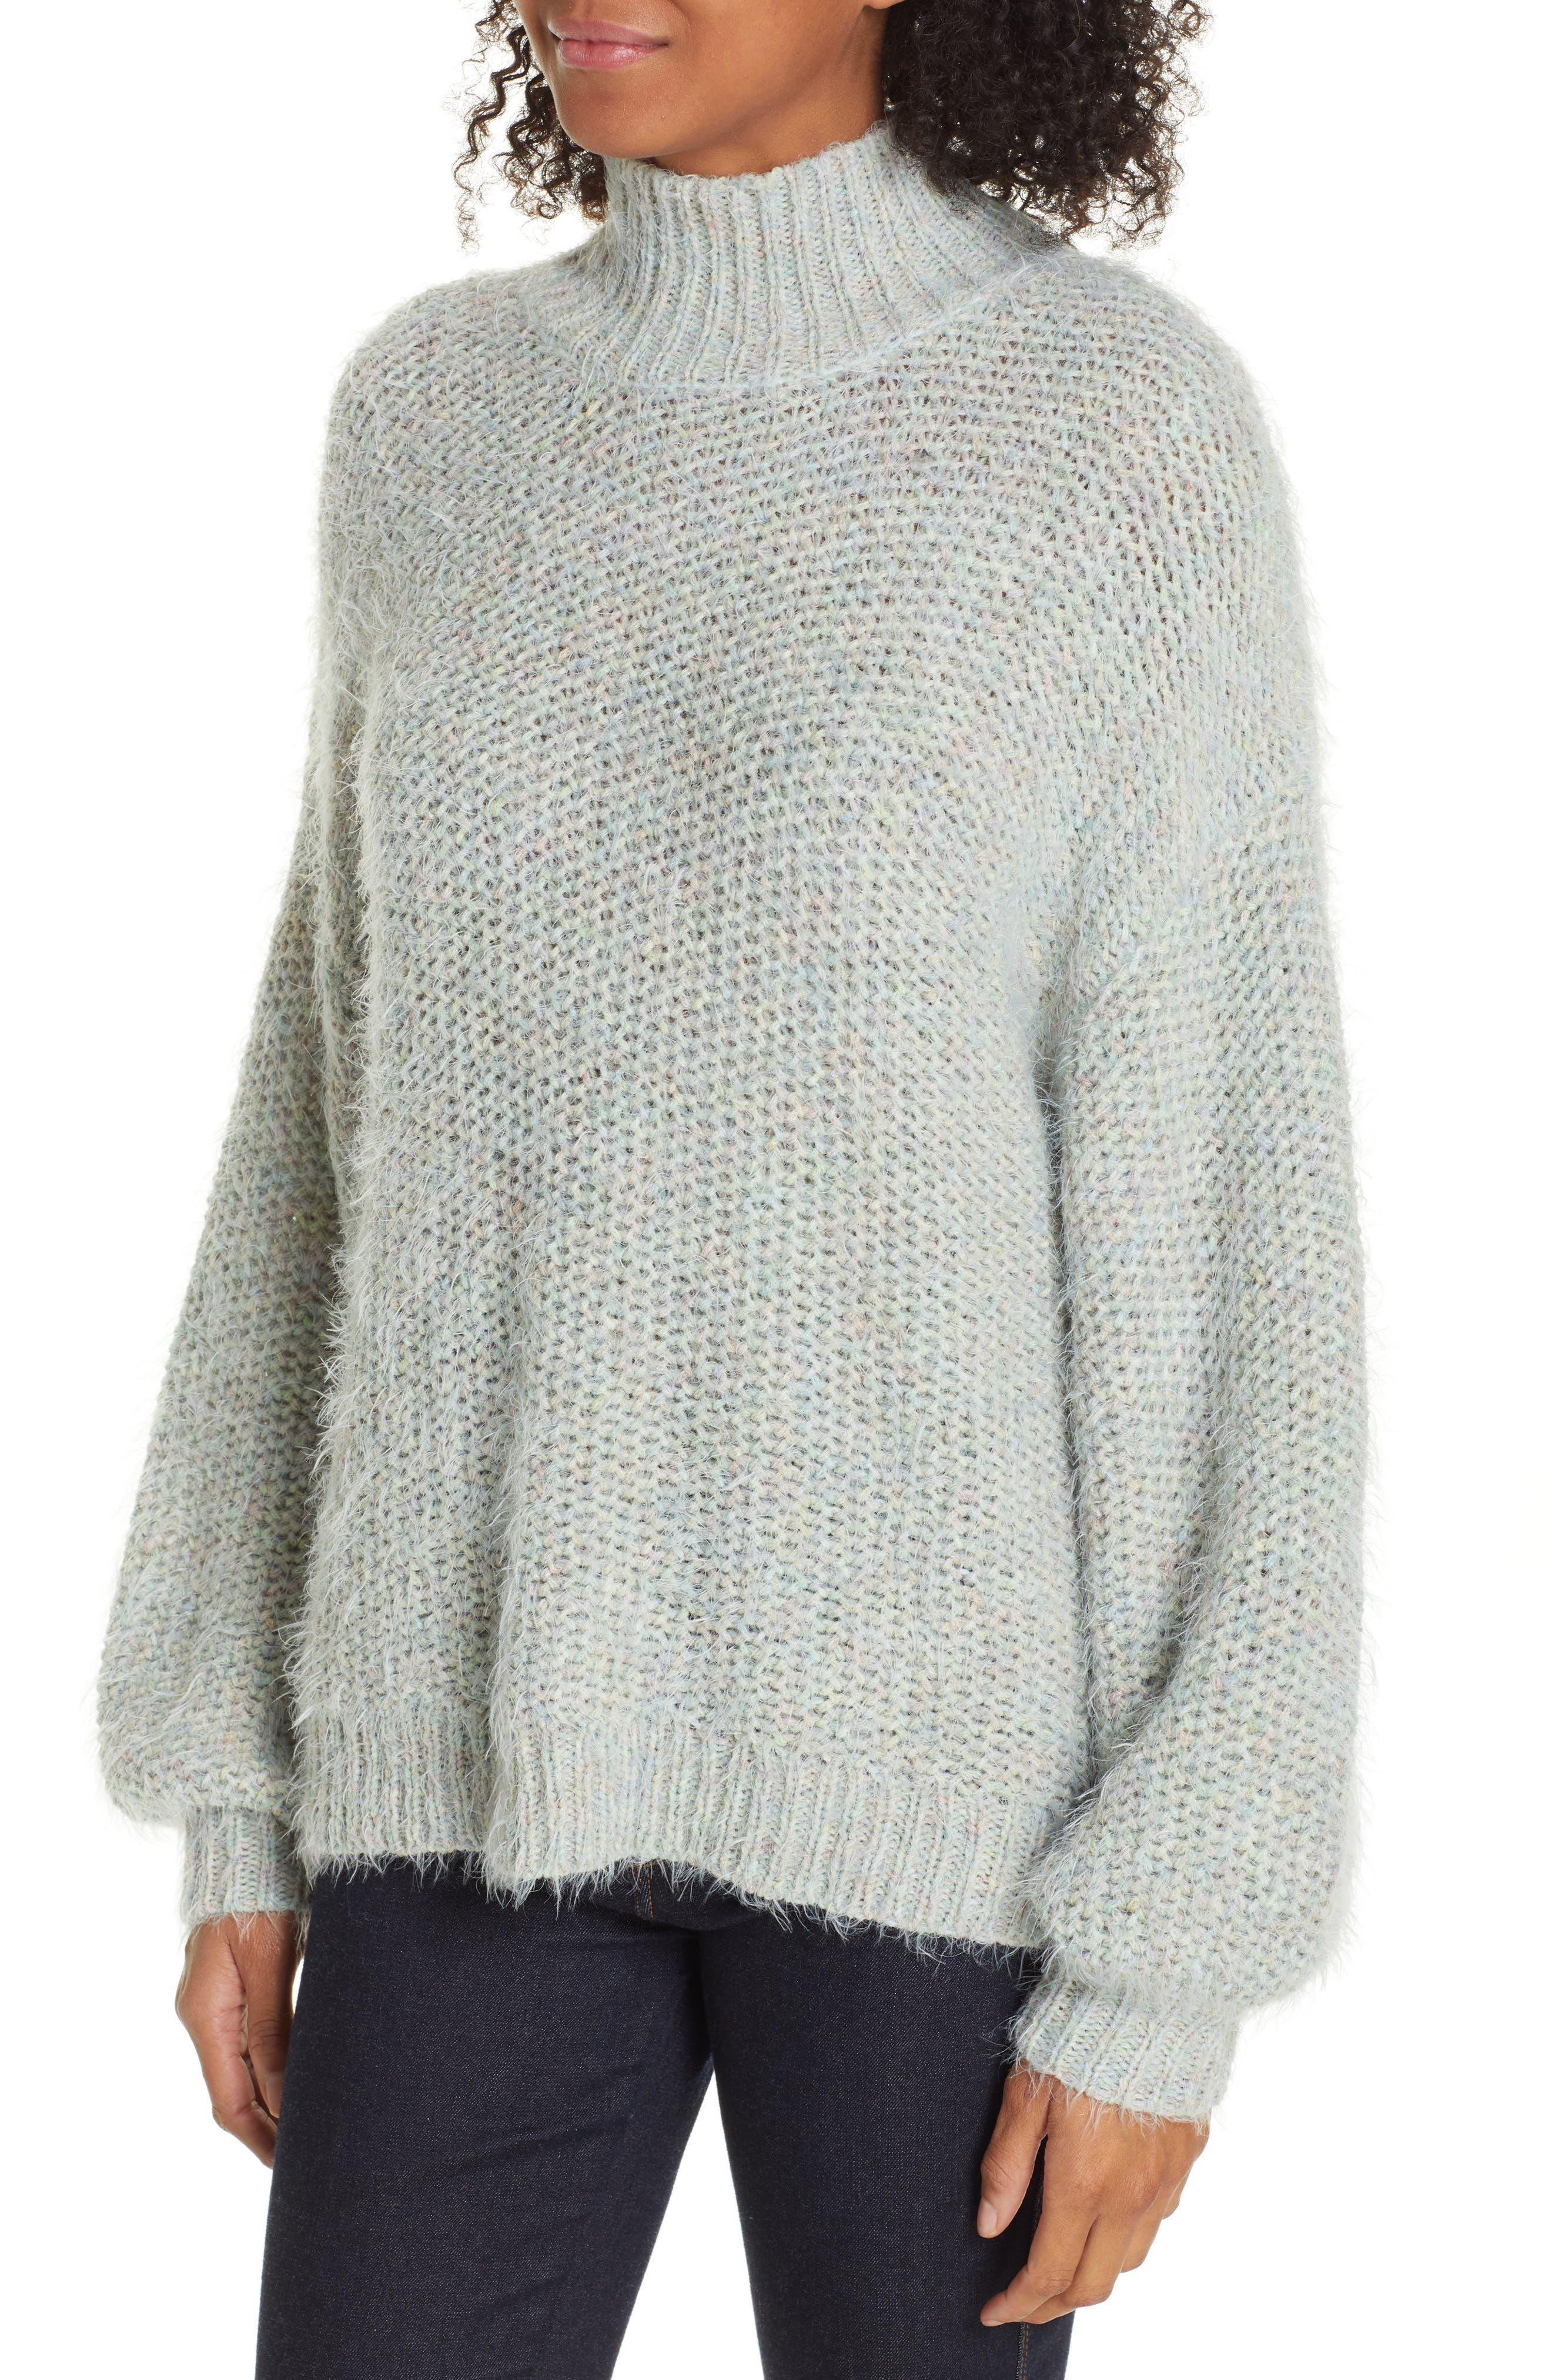 Markita Sweater,                             Alternate thumbnail 4, color,                             HEATHER CELADON